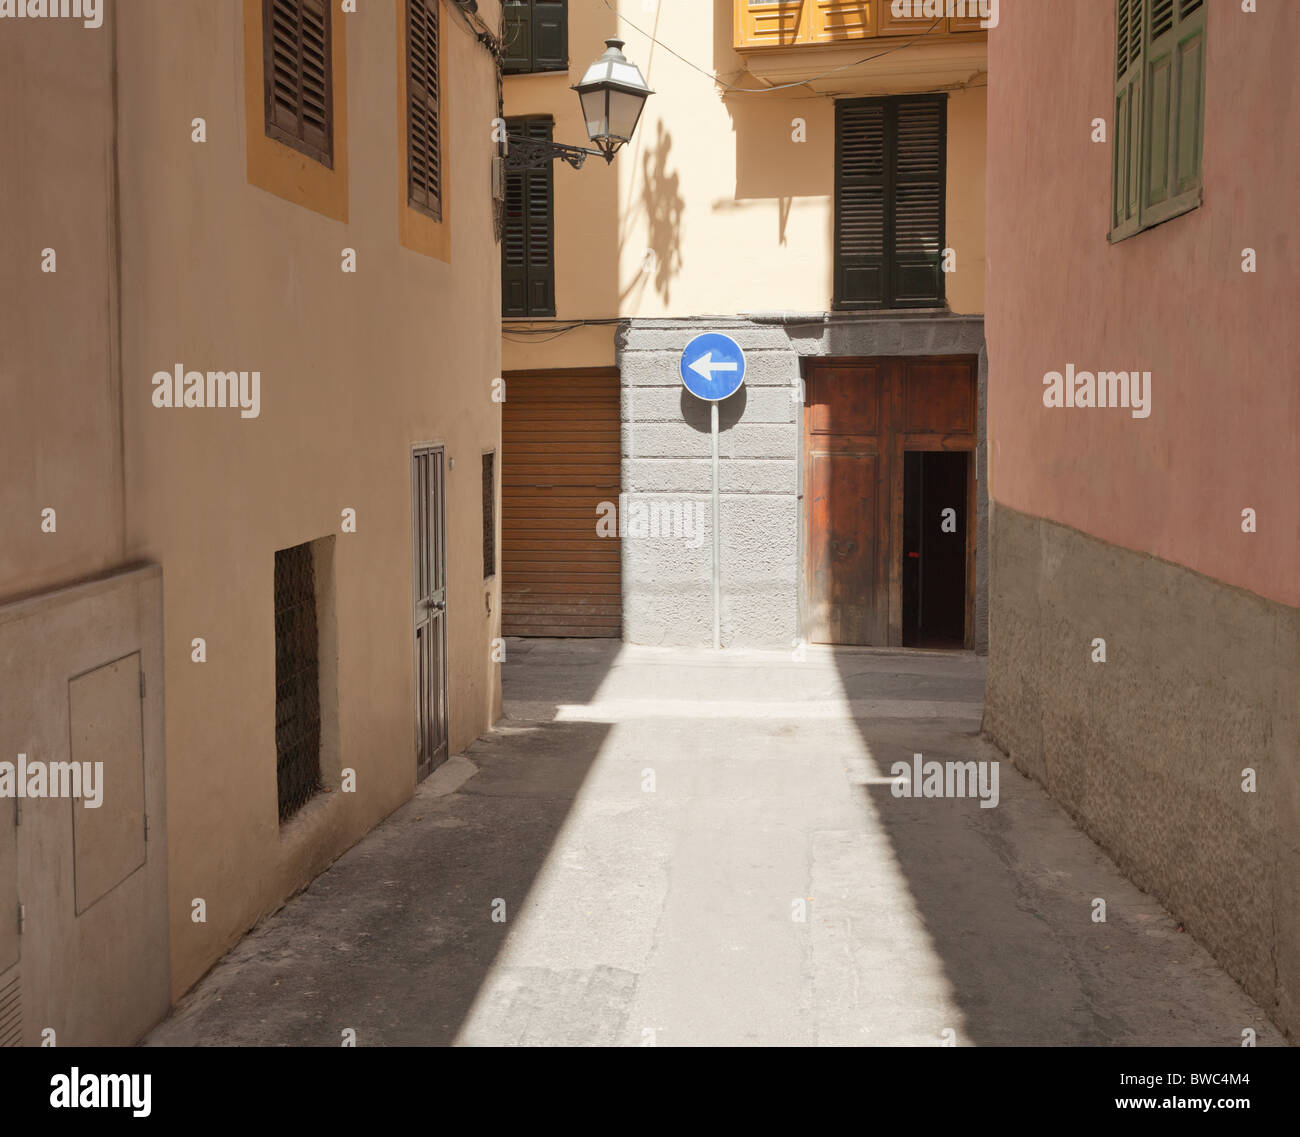 Straße mit Wegweiser Stockbild